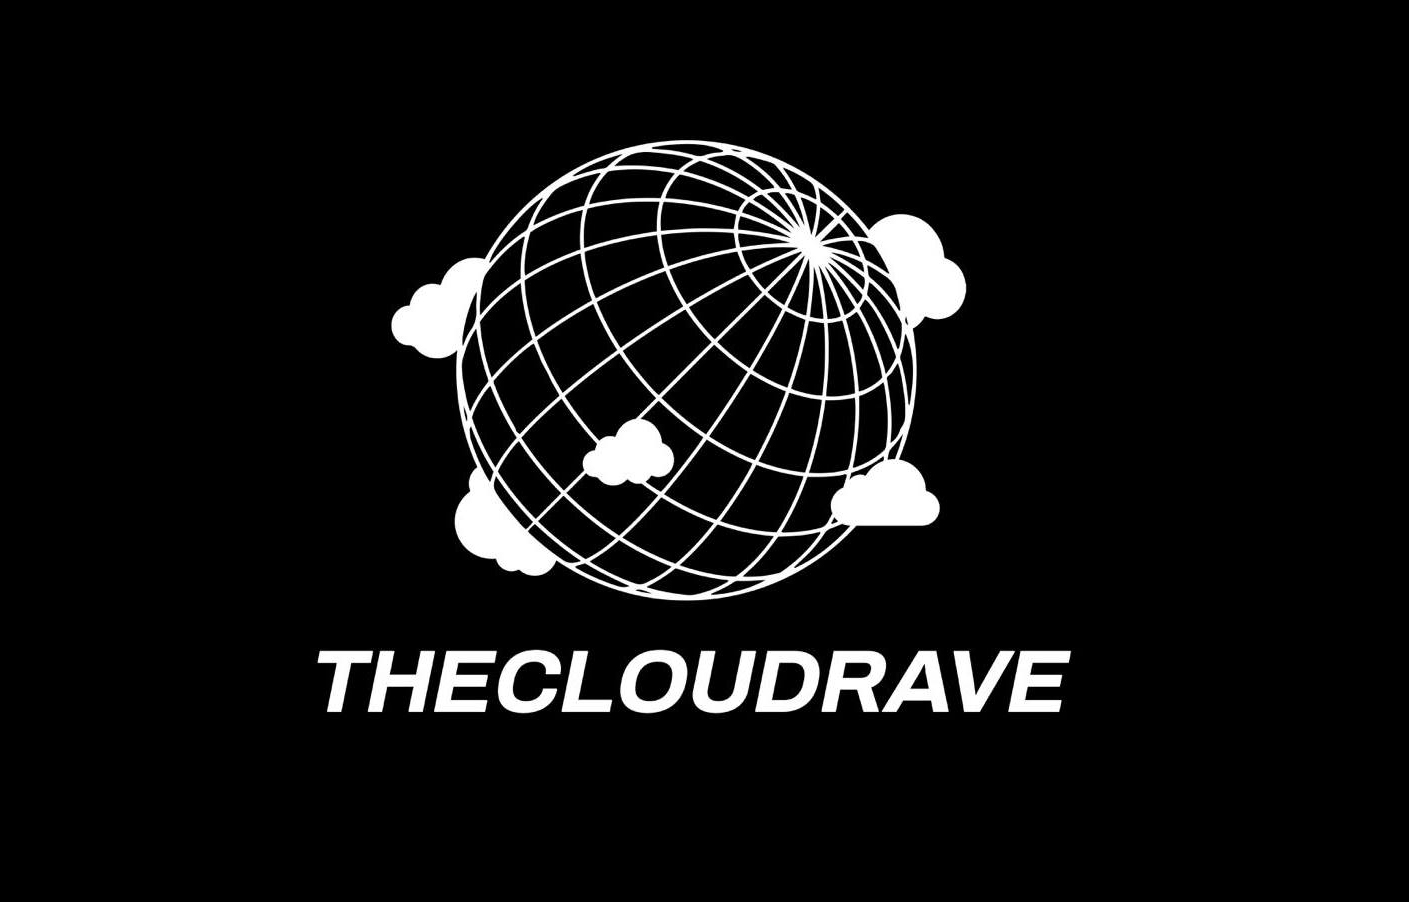 The Cloud Rave